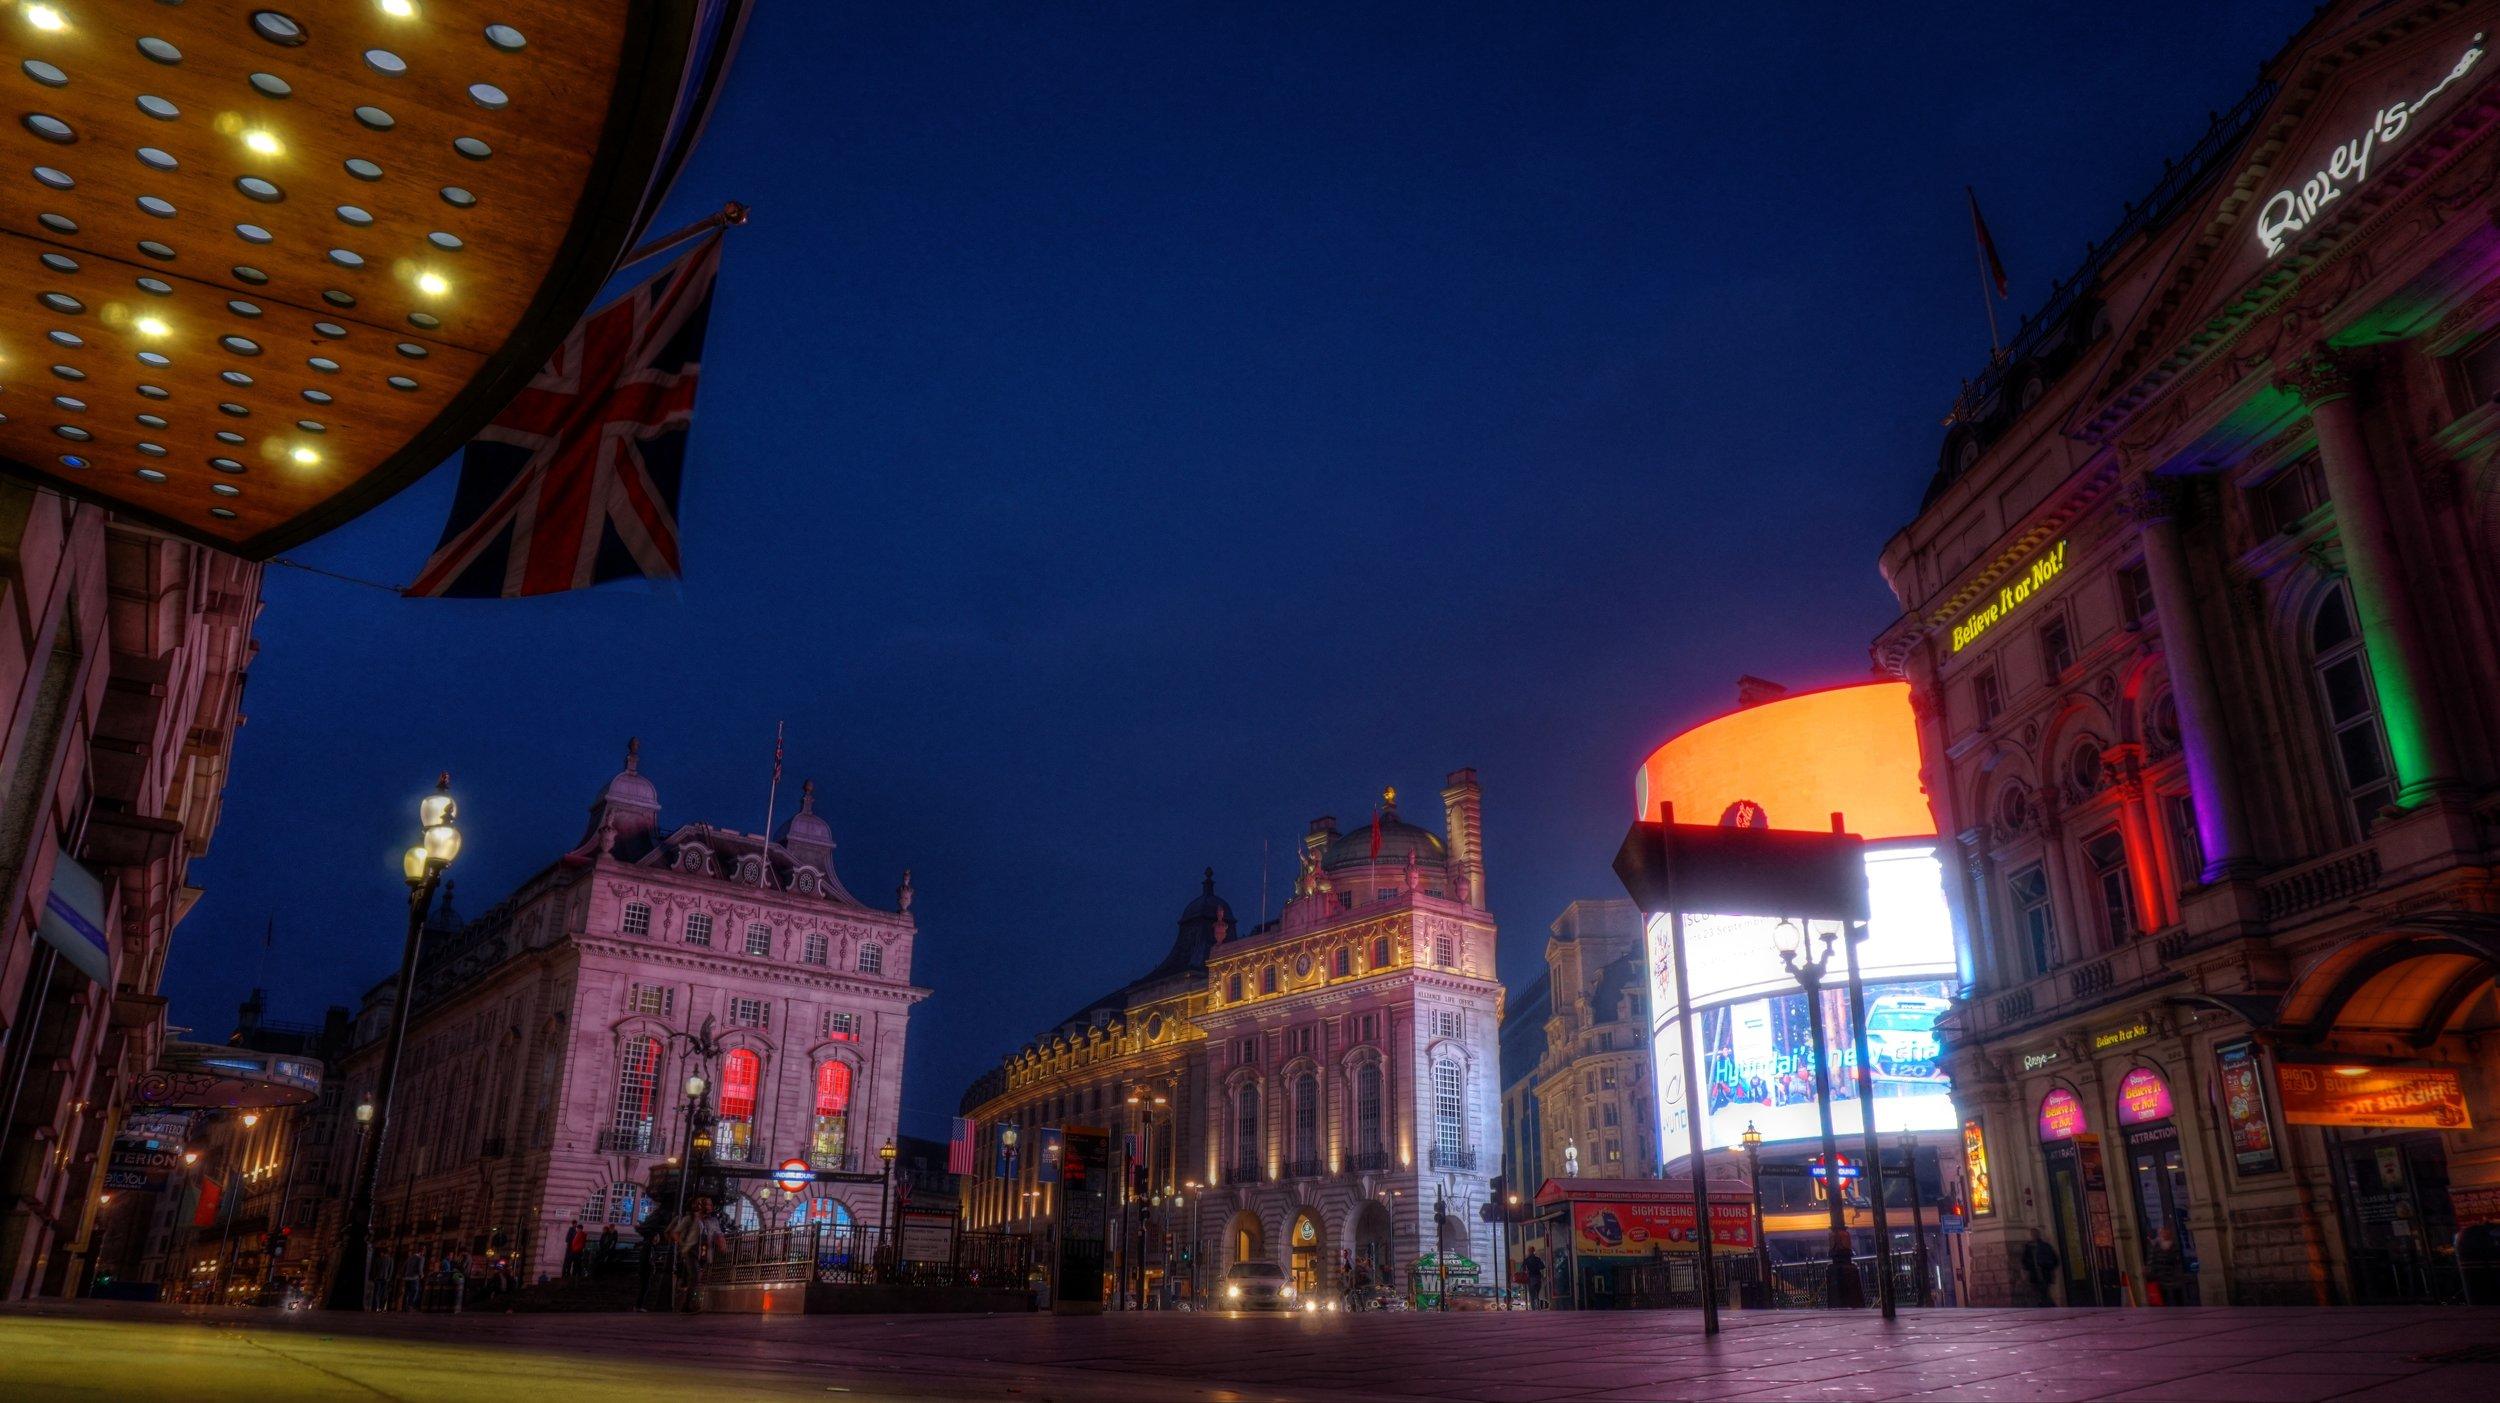 londonpoiccadillynight.jpg